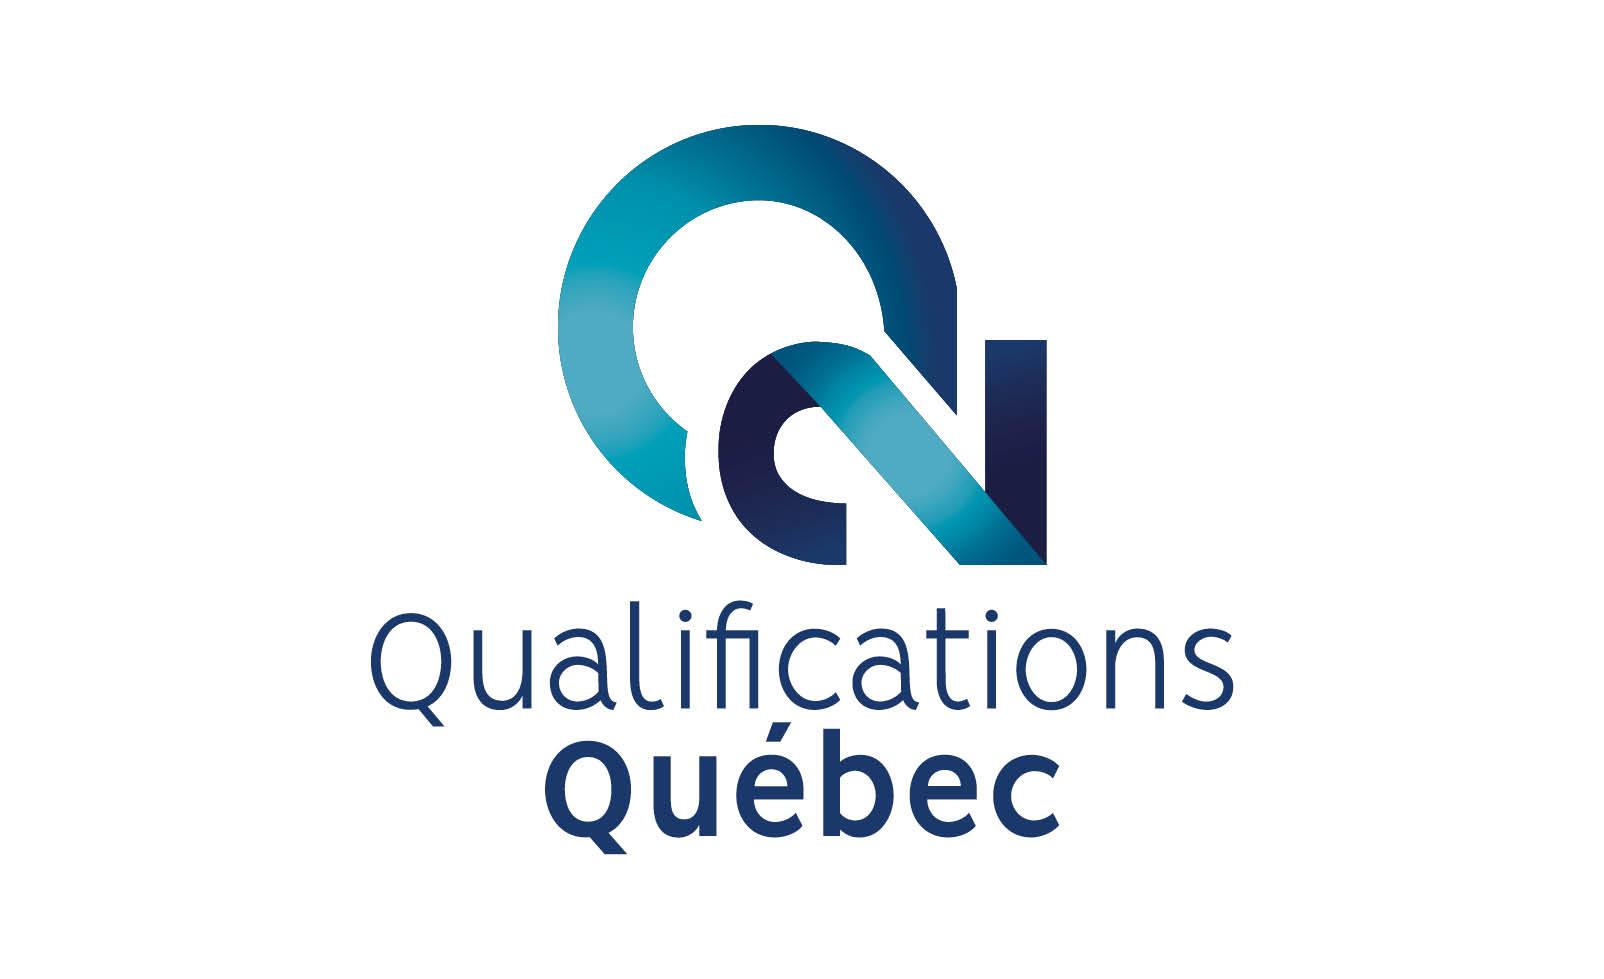 Qualifications Québec